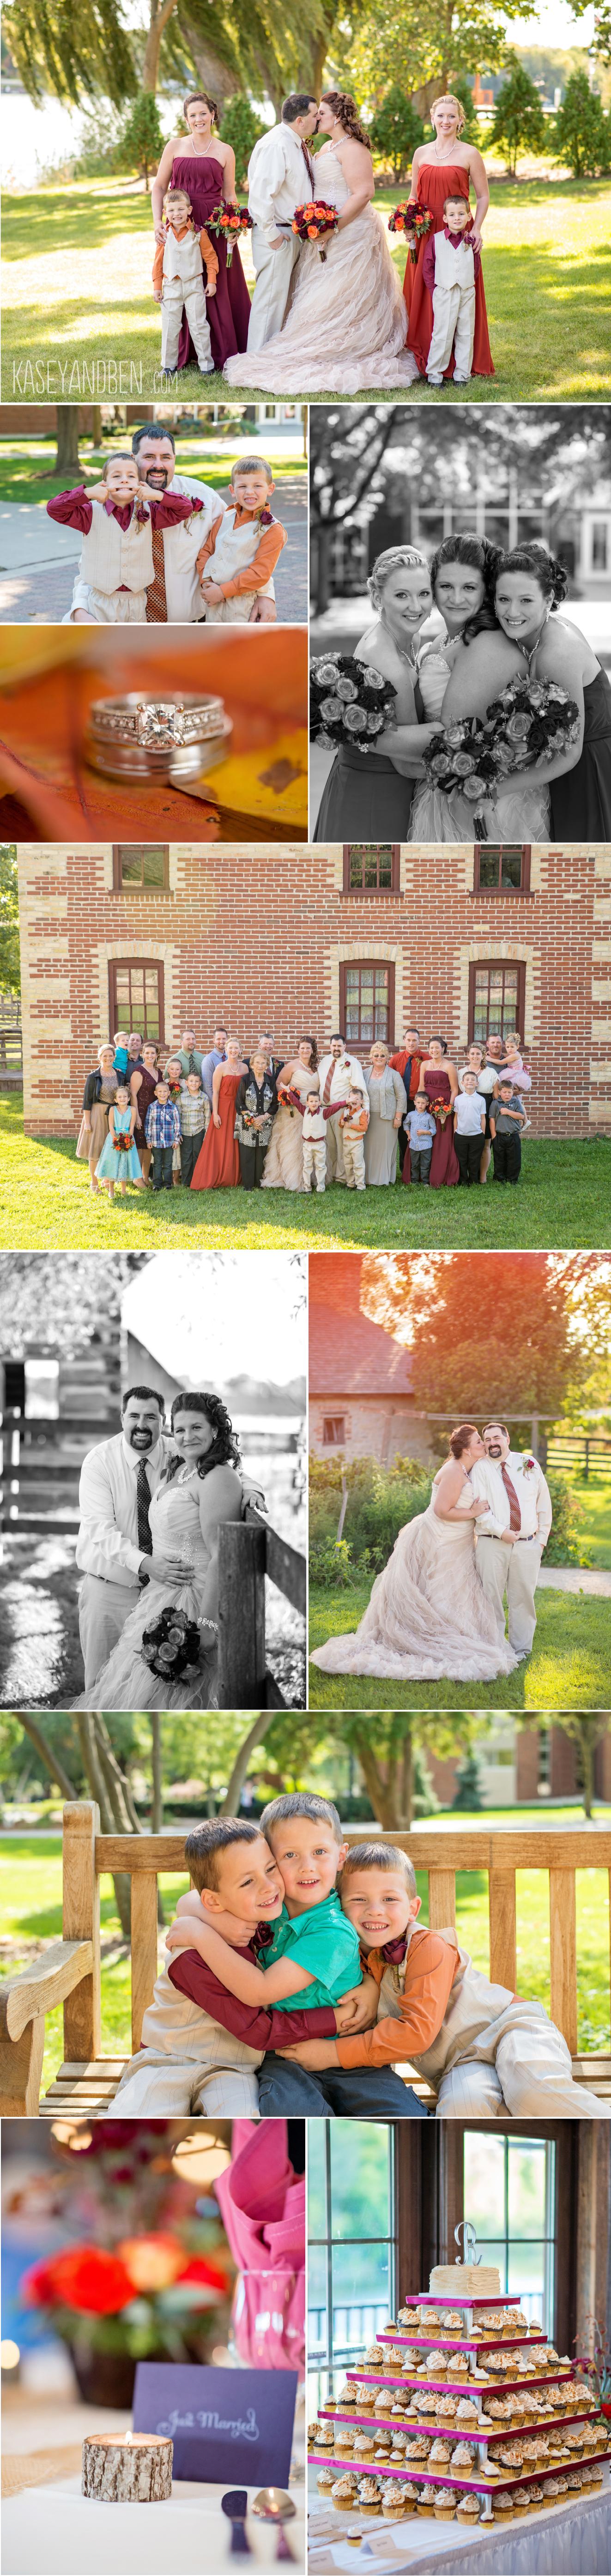 Heritage-Hill-Green-Bay-Wedding-Photographer-Olde-41-Vandervest-Children-Kids-Fall-Wisconsin-2